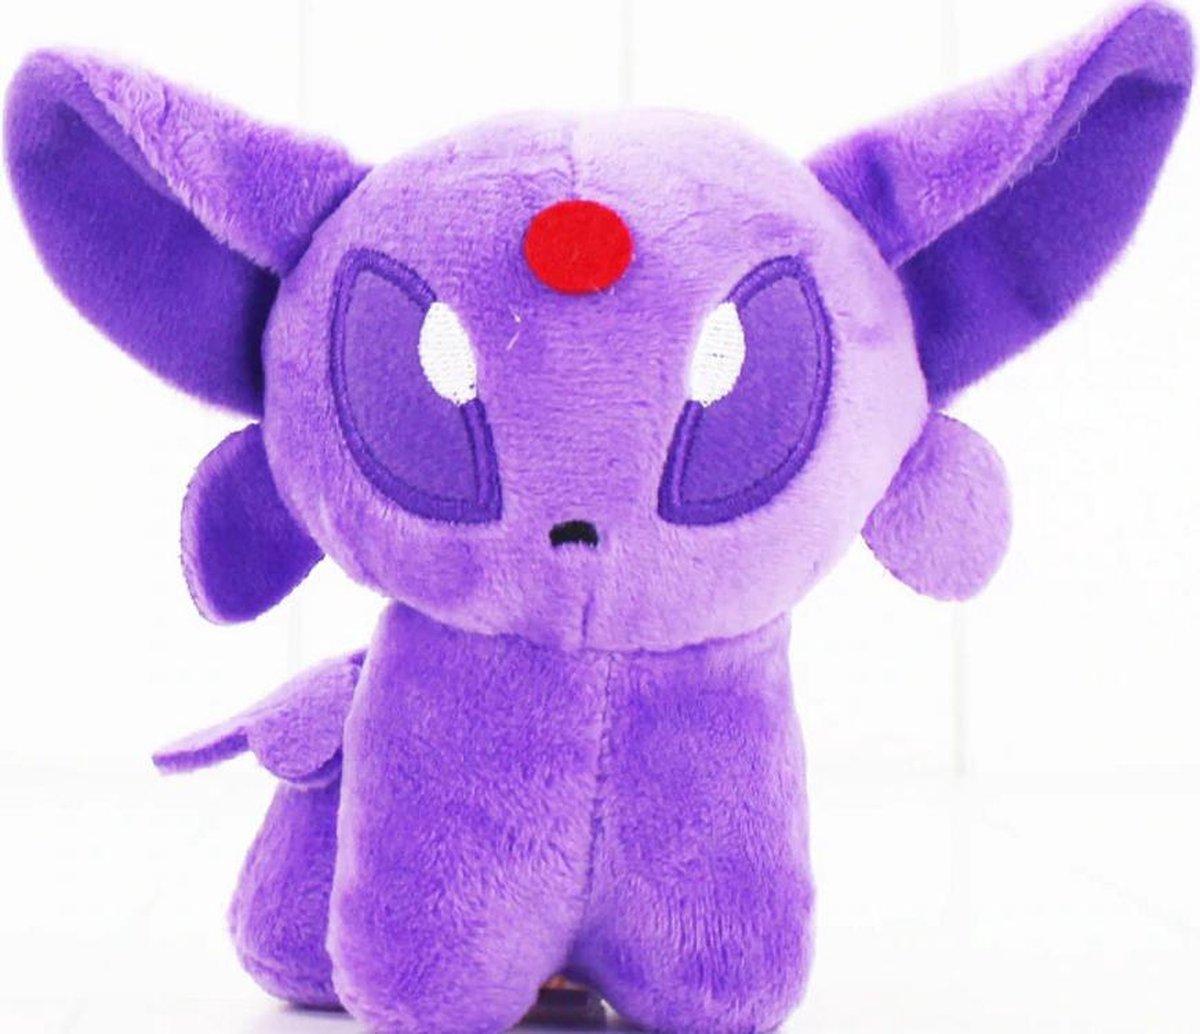 Knuffel Pokemon Espeon - bekend van de TV - creator - Pokémon - pokéball - speelgoed - Plushe